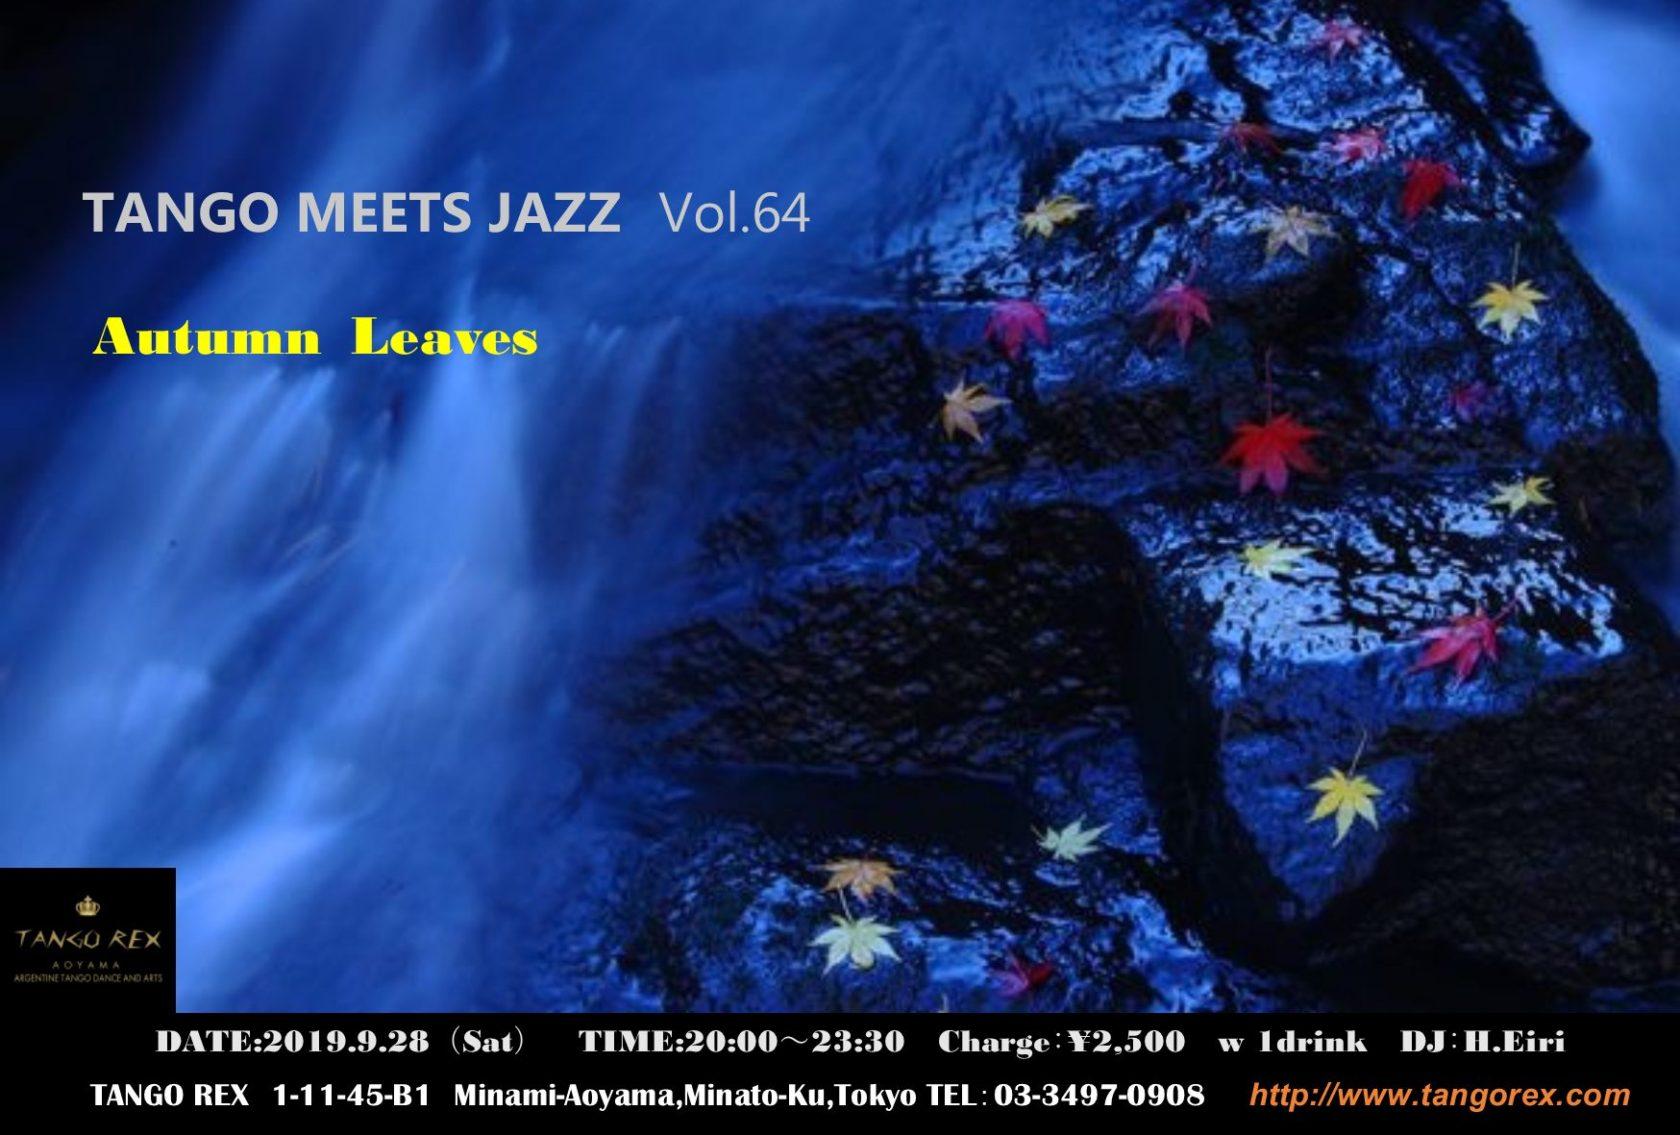 9/28 Tango Meets Jazz vol.64開催